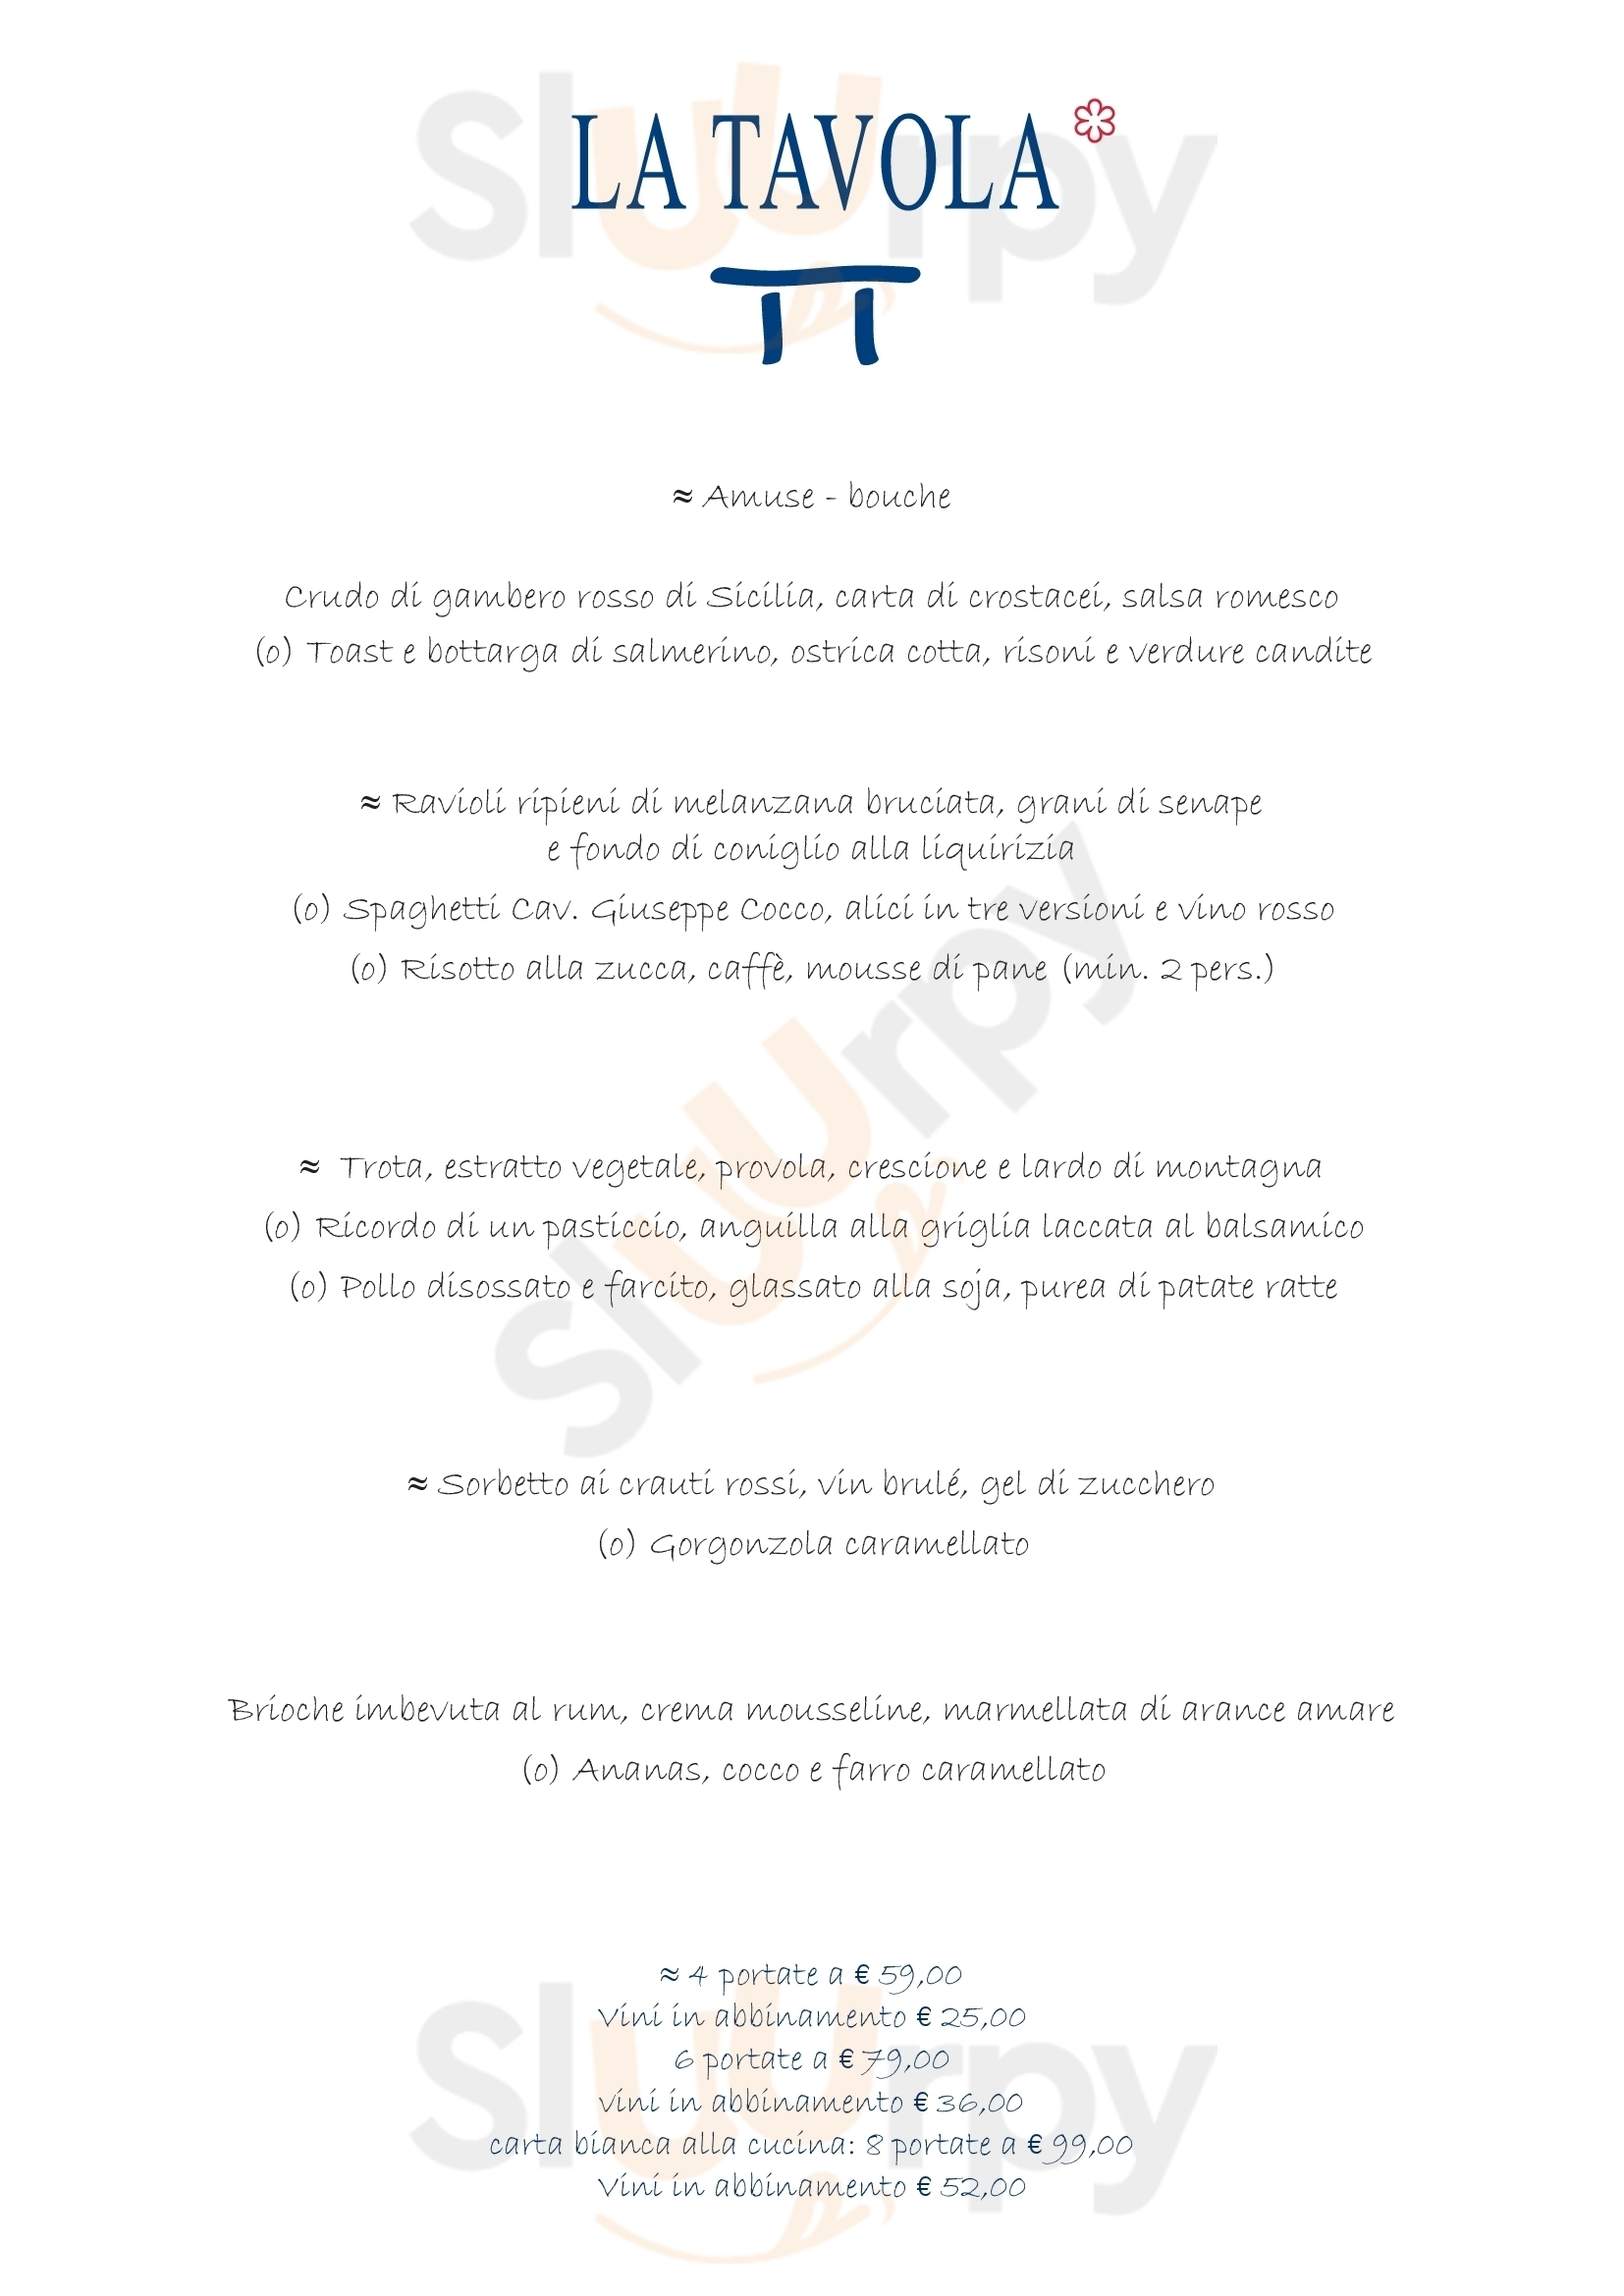 La Tavola Laveno-Mombello menù 1 pagina